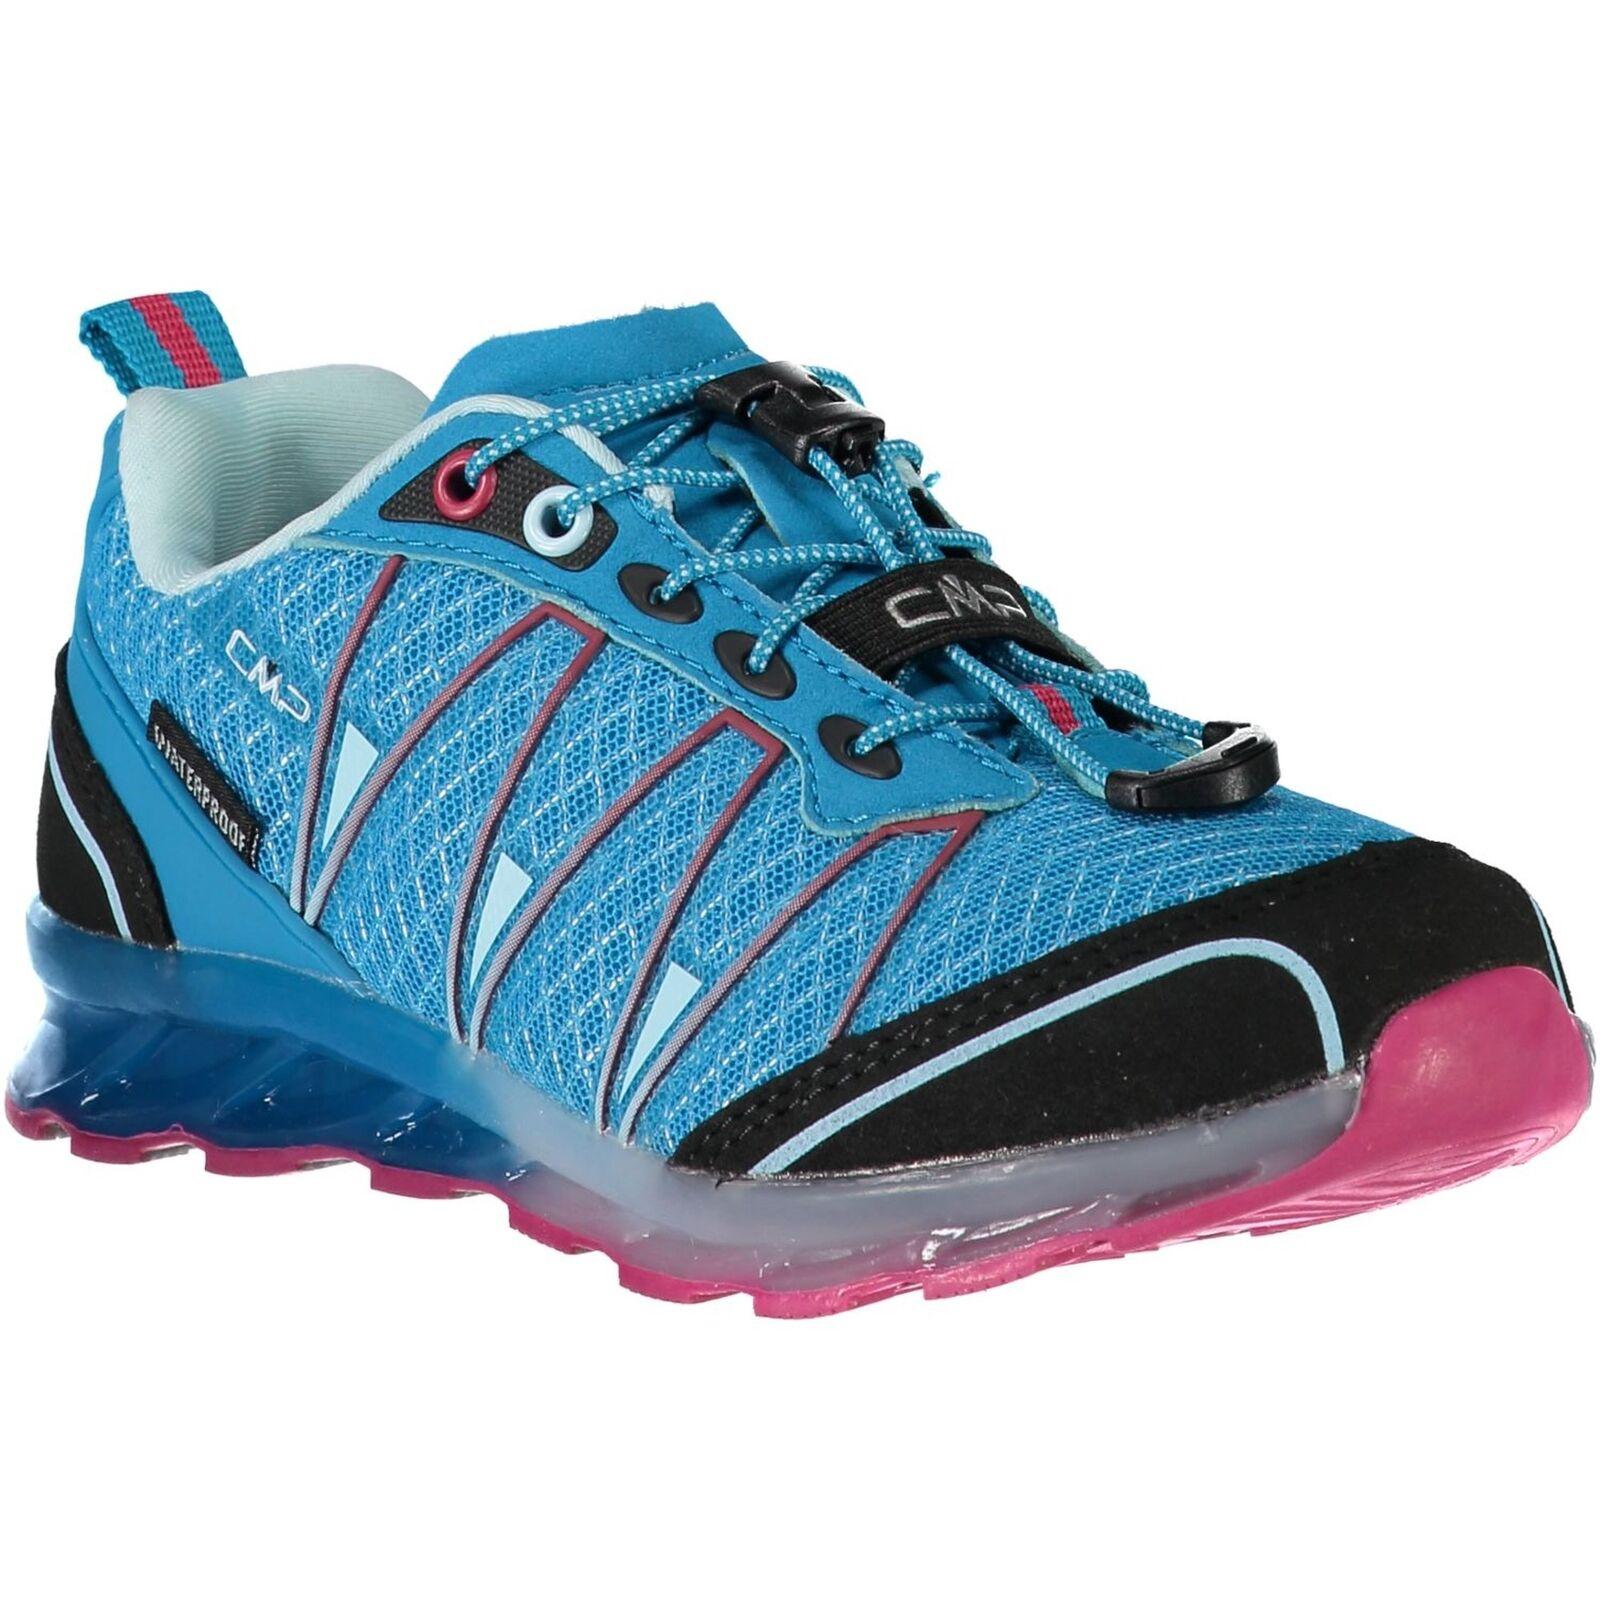 CMP running shoes sport  ldren altak trail wp  waterproof blue  just buy it